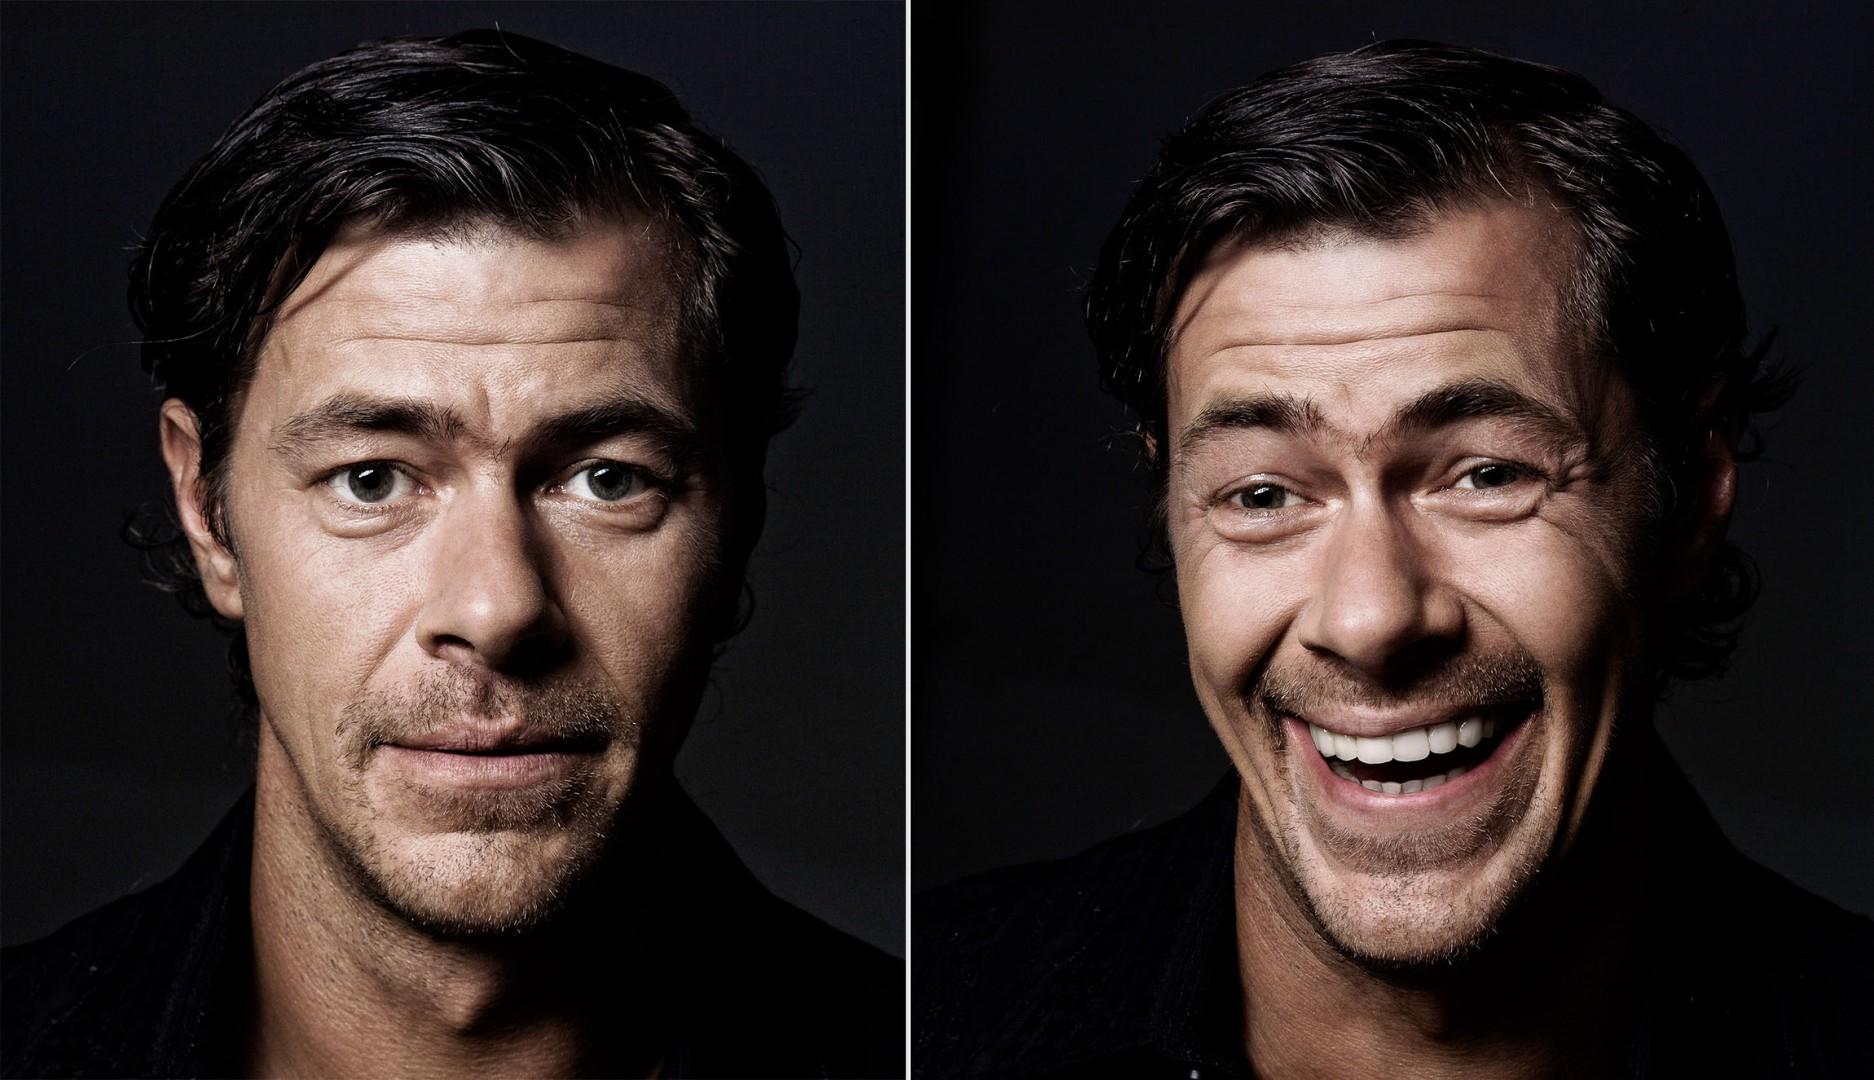 Portrait Schauspieler Fotografie Werbefotografie